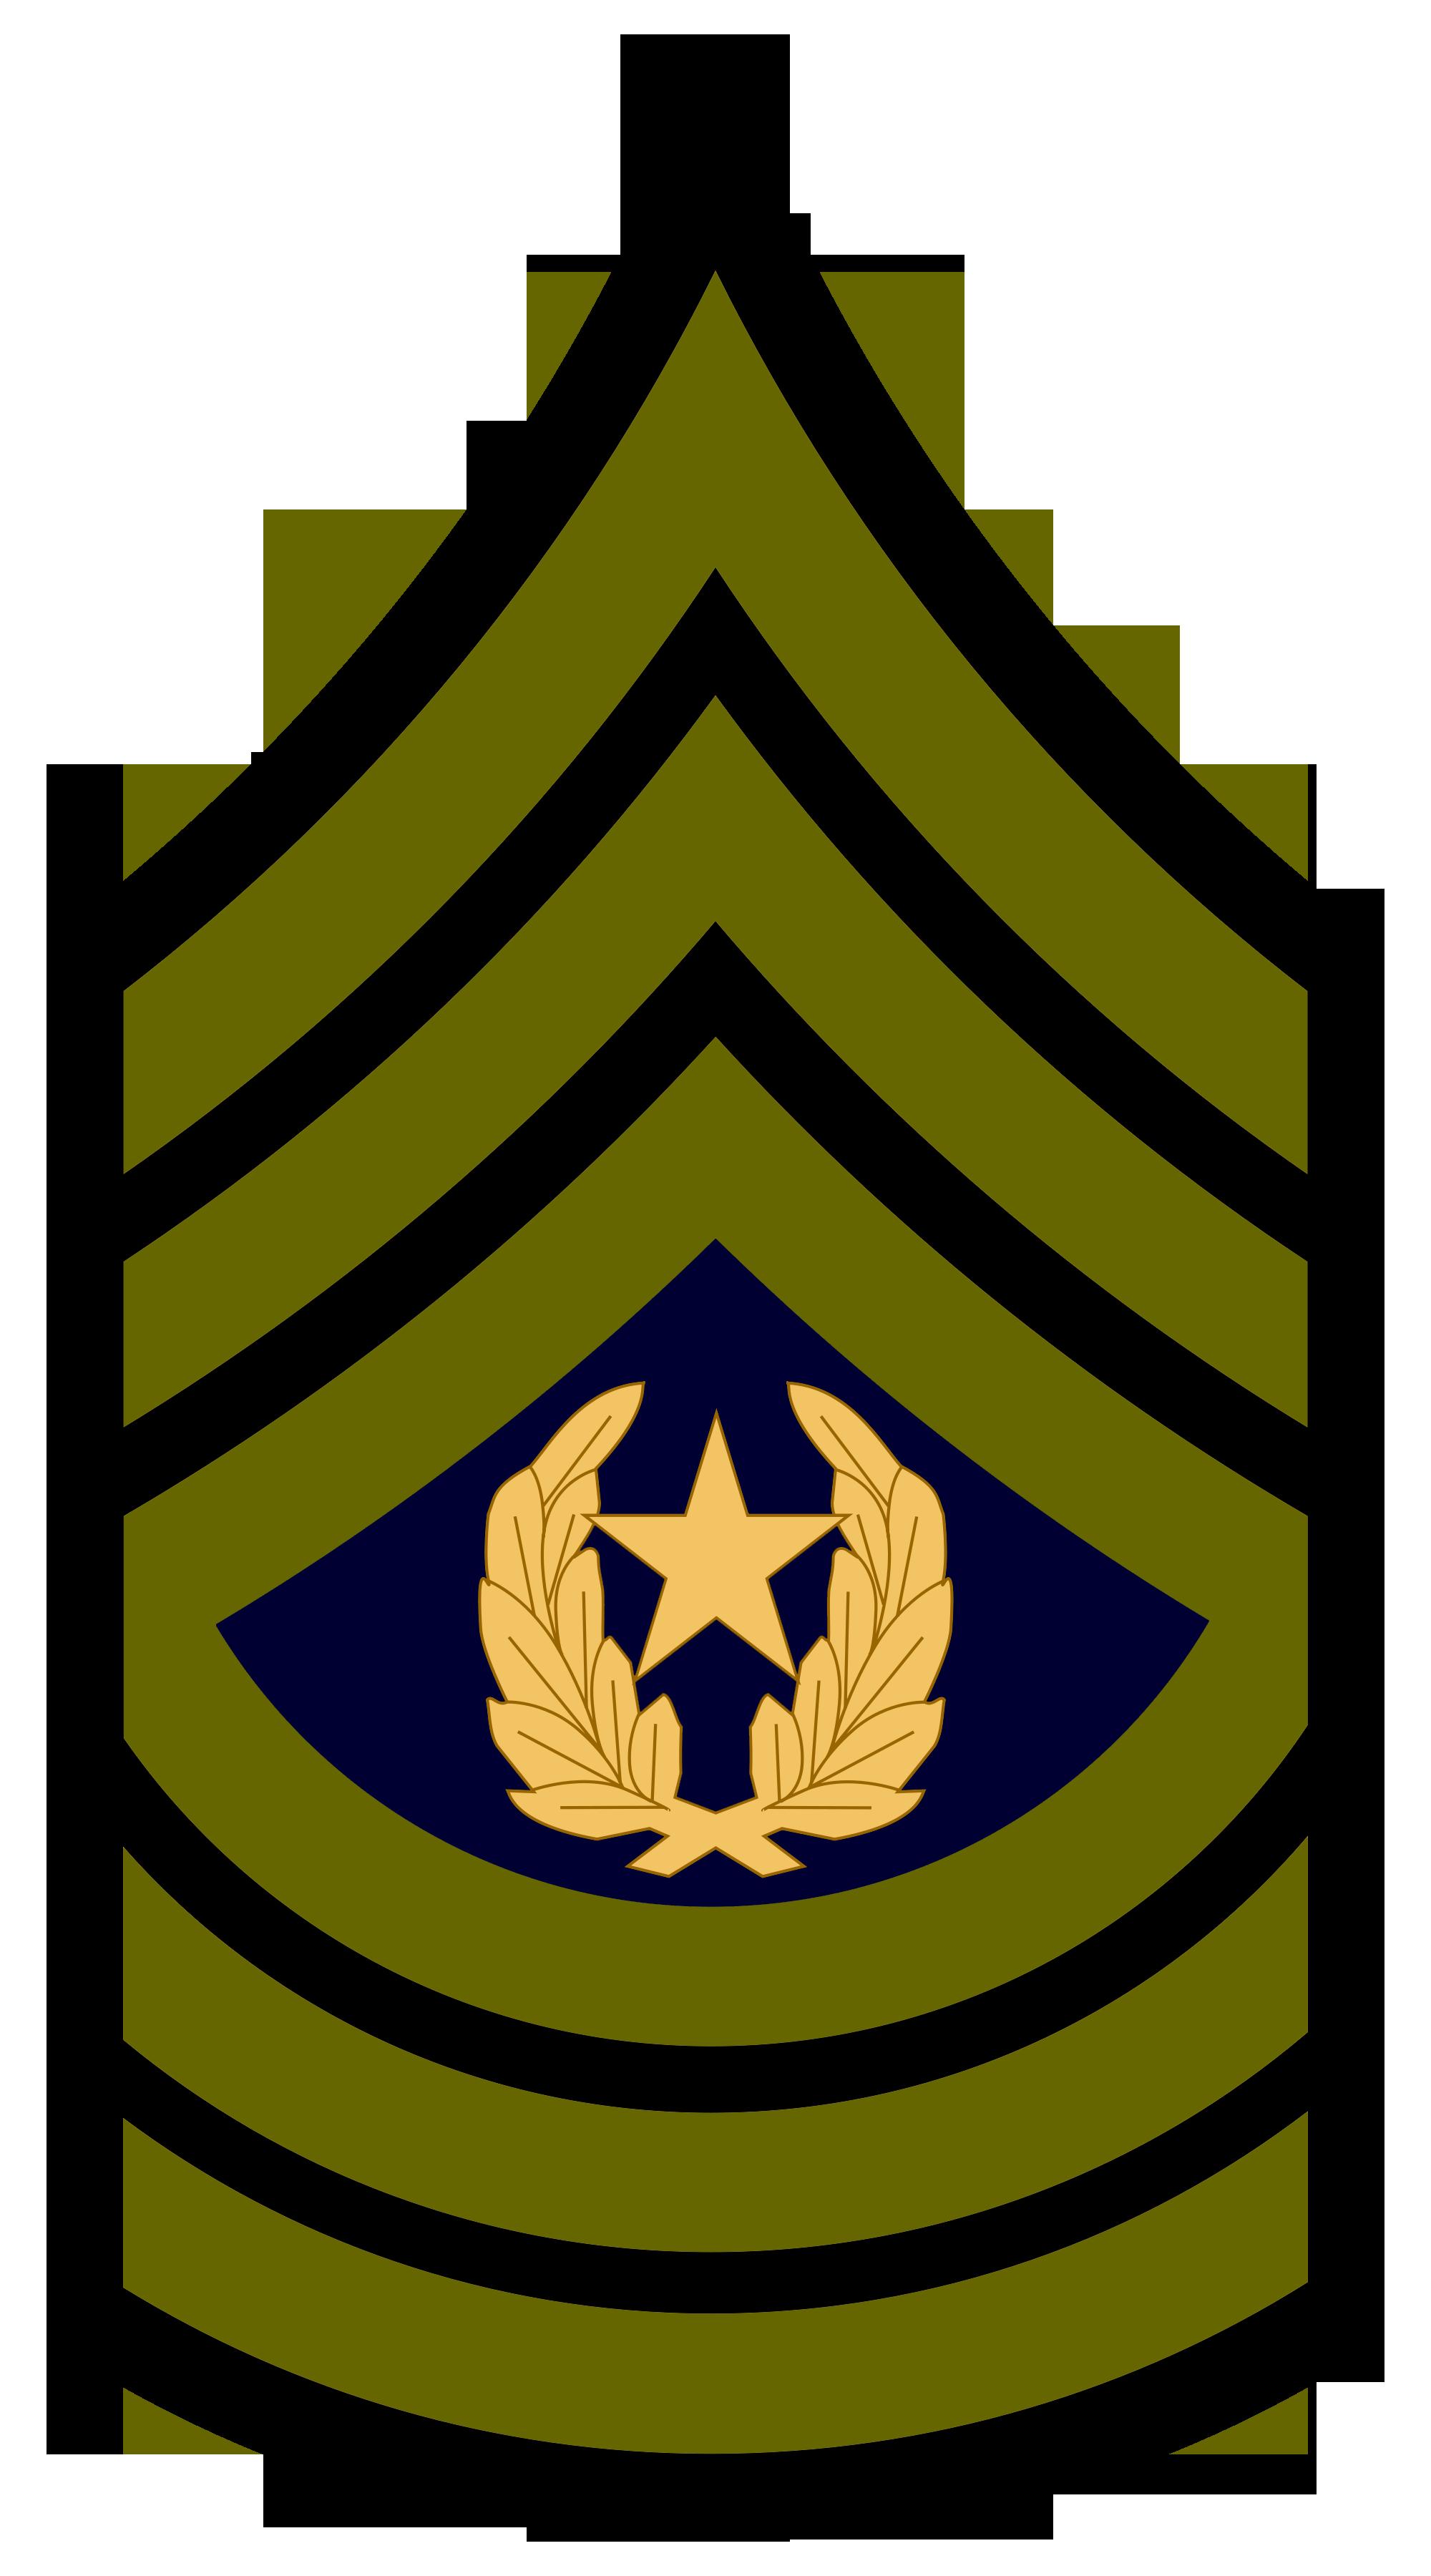 Army Csm Rank PNG - 133332